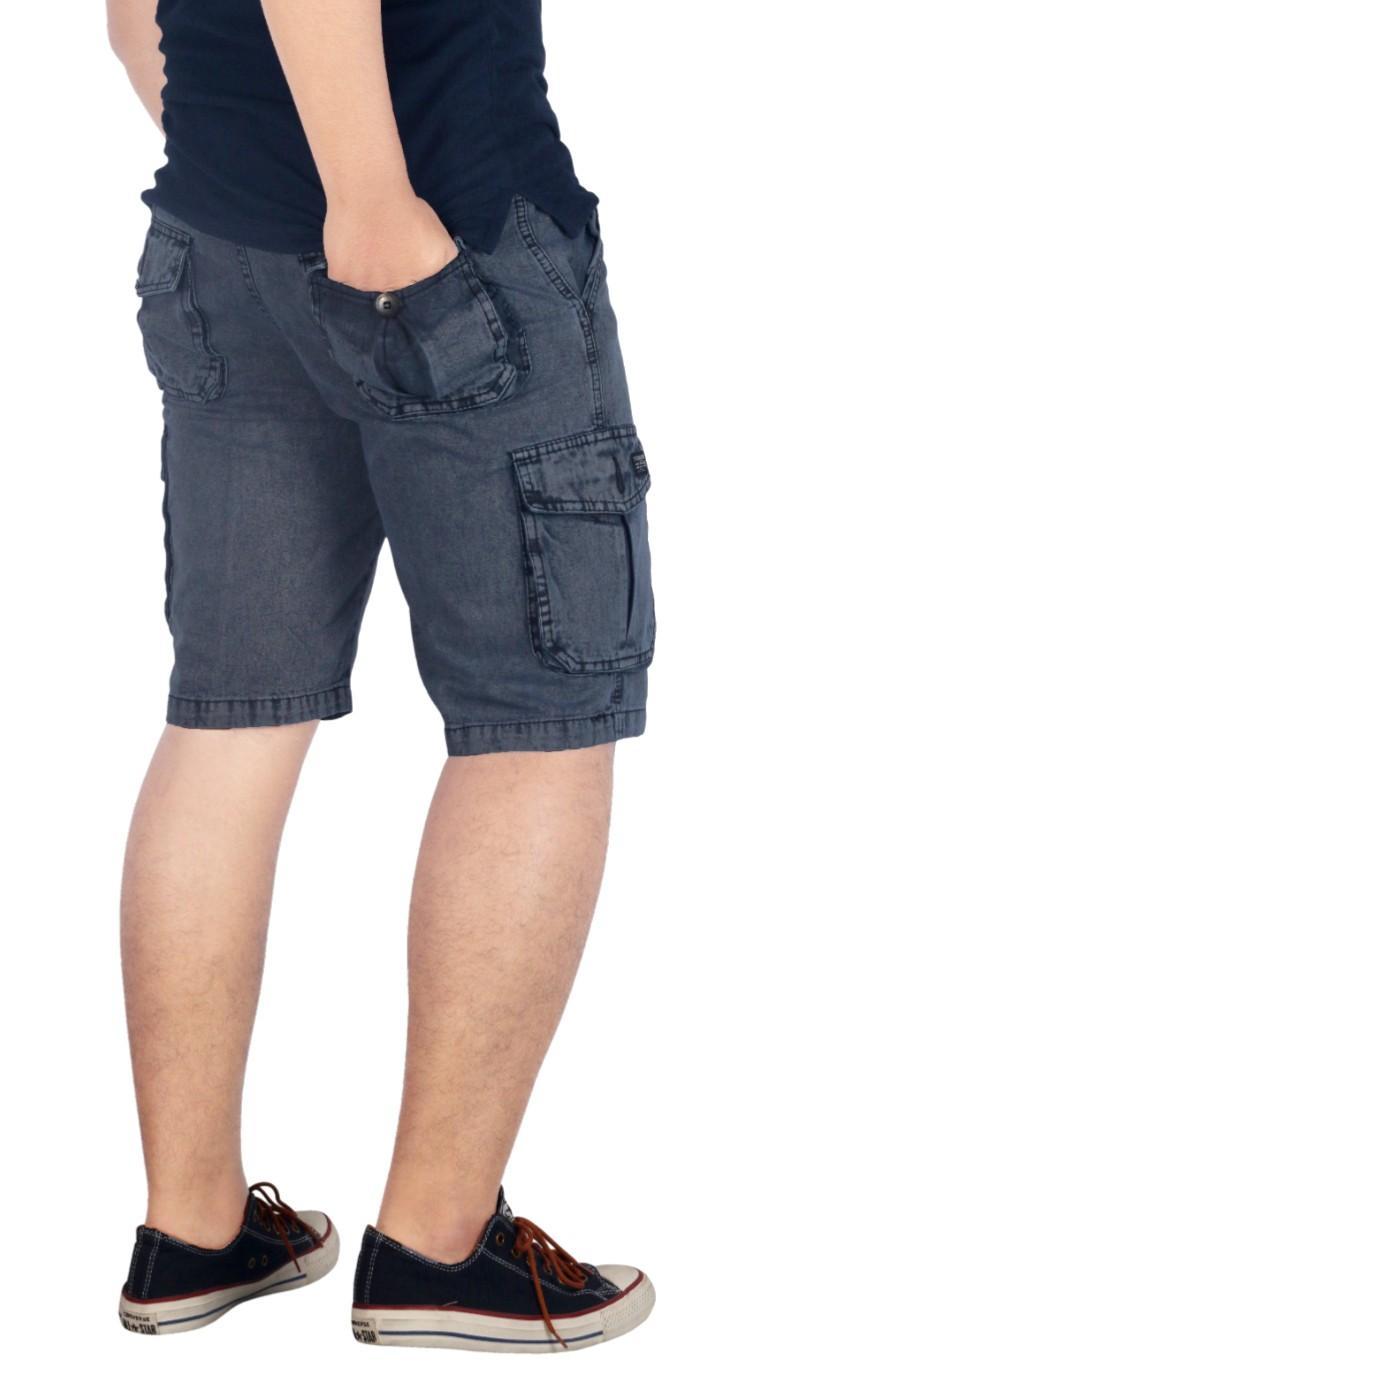 Bsg_Fashion1 Celana Pendek Hitam Polos Distro Import/ Celana Skinny/Celana Pants/Celana Santai/Celana Casual/Celana Motif/Celana Polos/Celana Pria/Celana Cino/Celana Pantai/Celana Denim/Celana Jeans / CELENA ARMY / CELANA JEANS KARGO /CELANA KARGO AN 1999